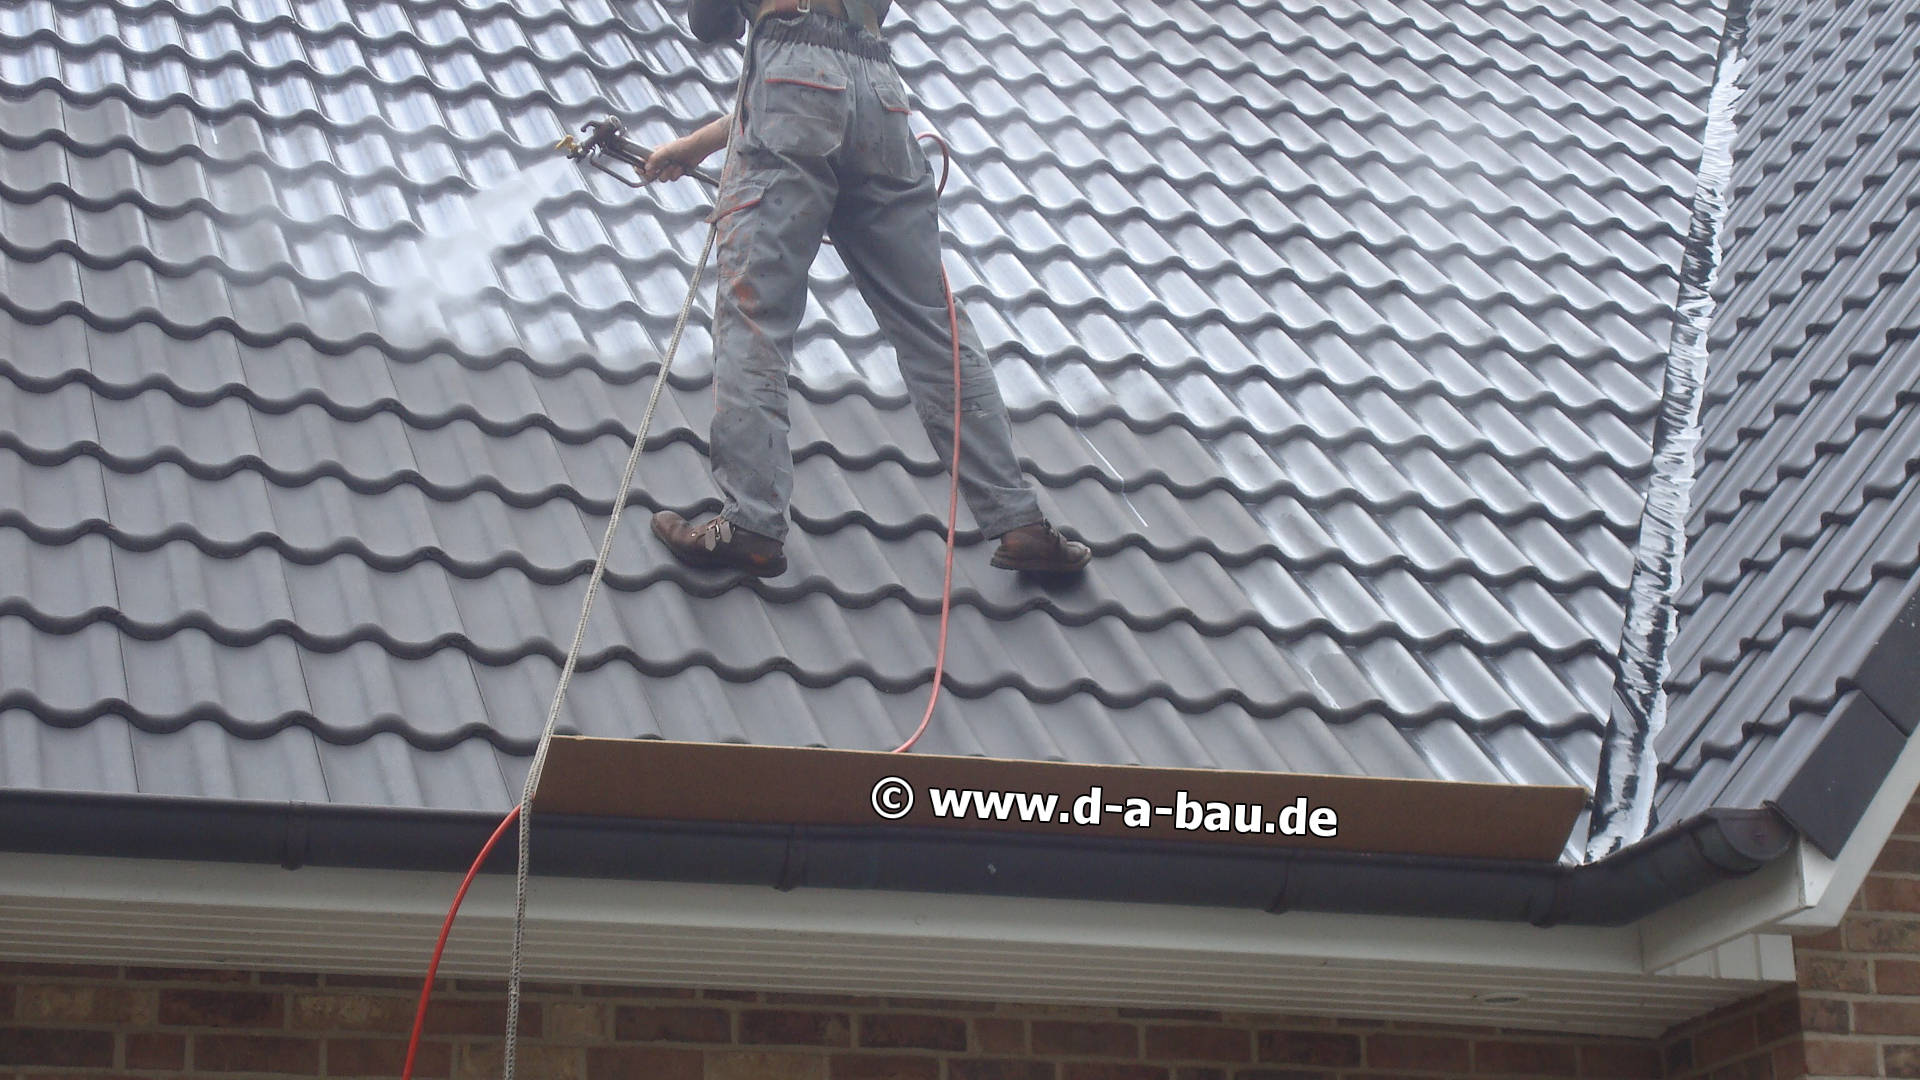 moos vom dach entfernen referenzen der betonpflaster reinigung beton pflaster dachreinigung. Black Bedroom Furniture Sets. Home Design Ideas